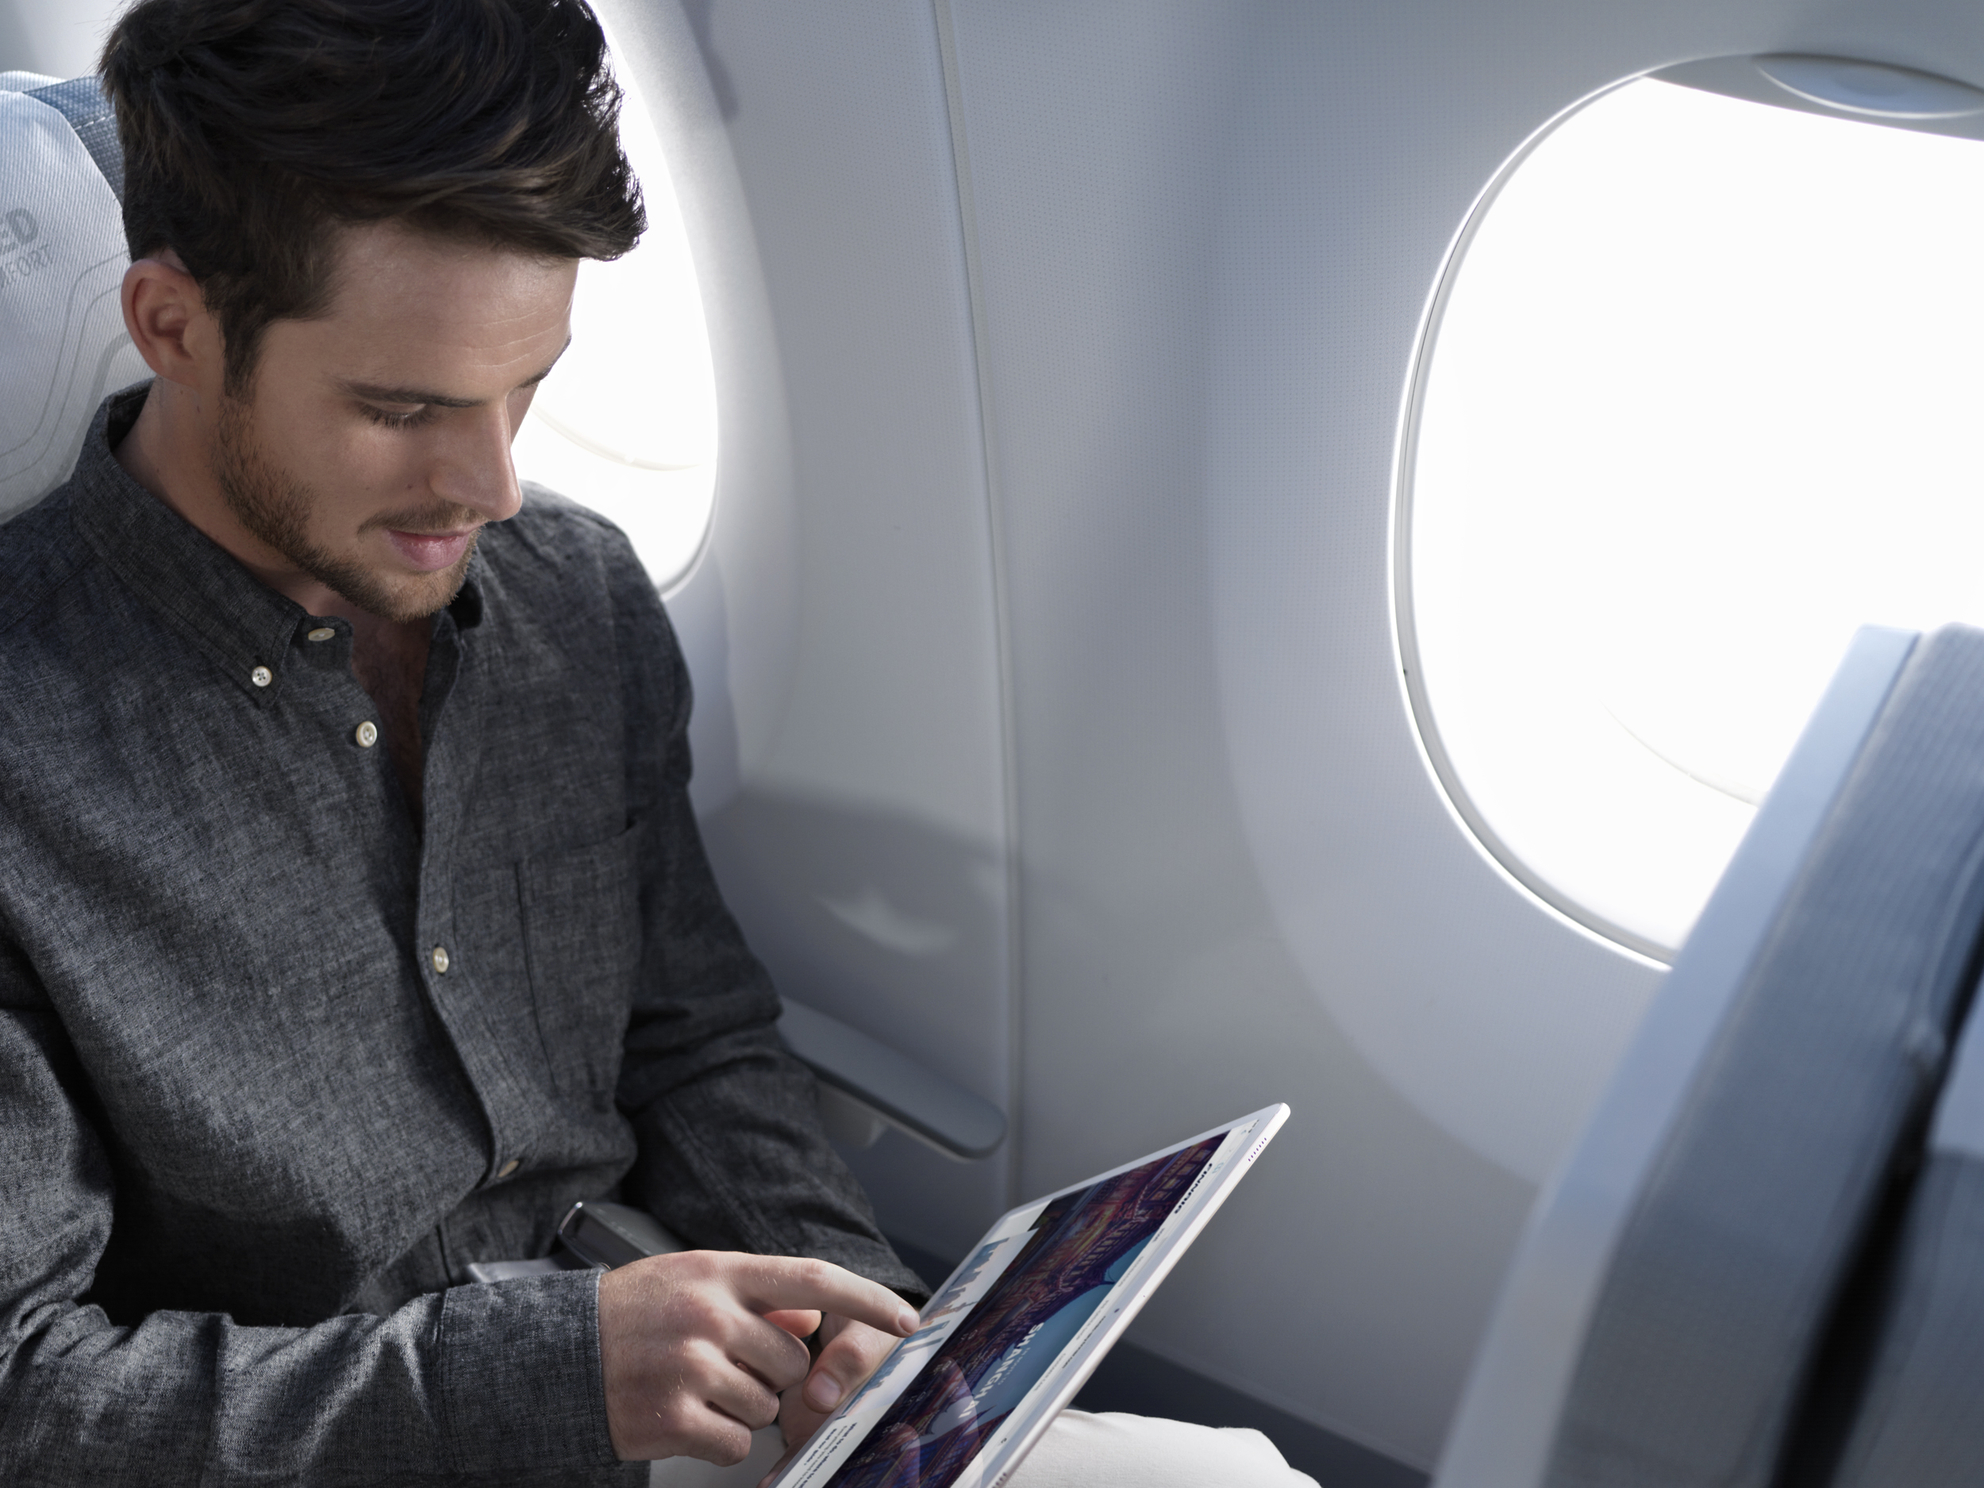 Finnair_A350_economy_class_tablet_cropped.jpg